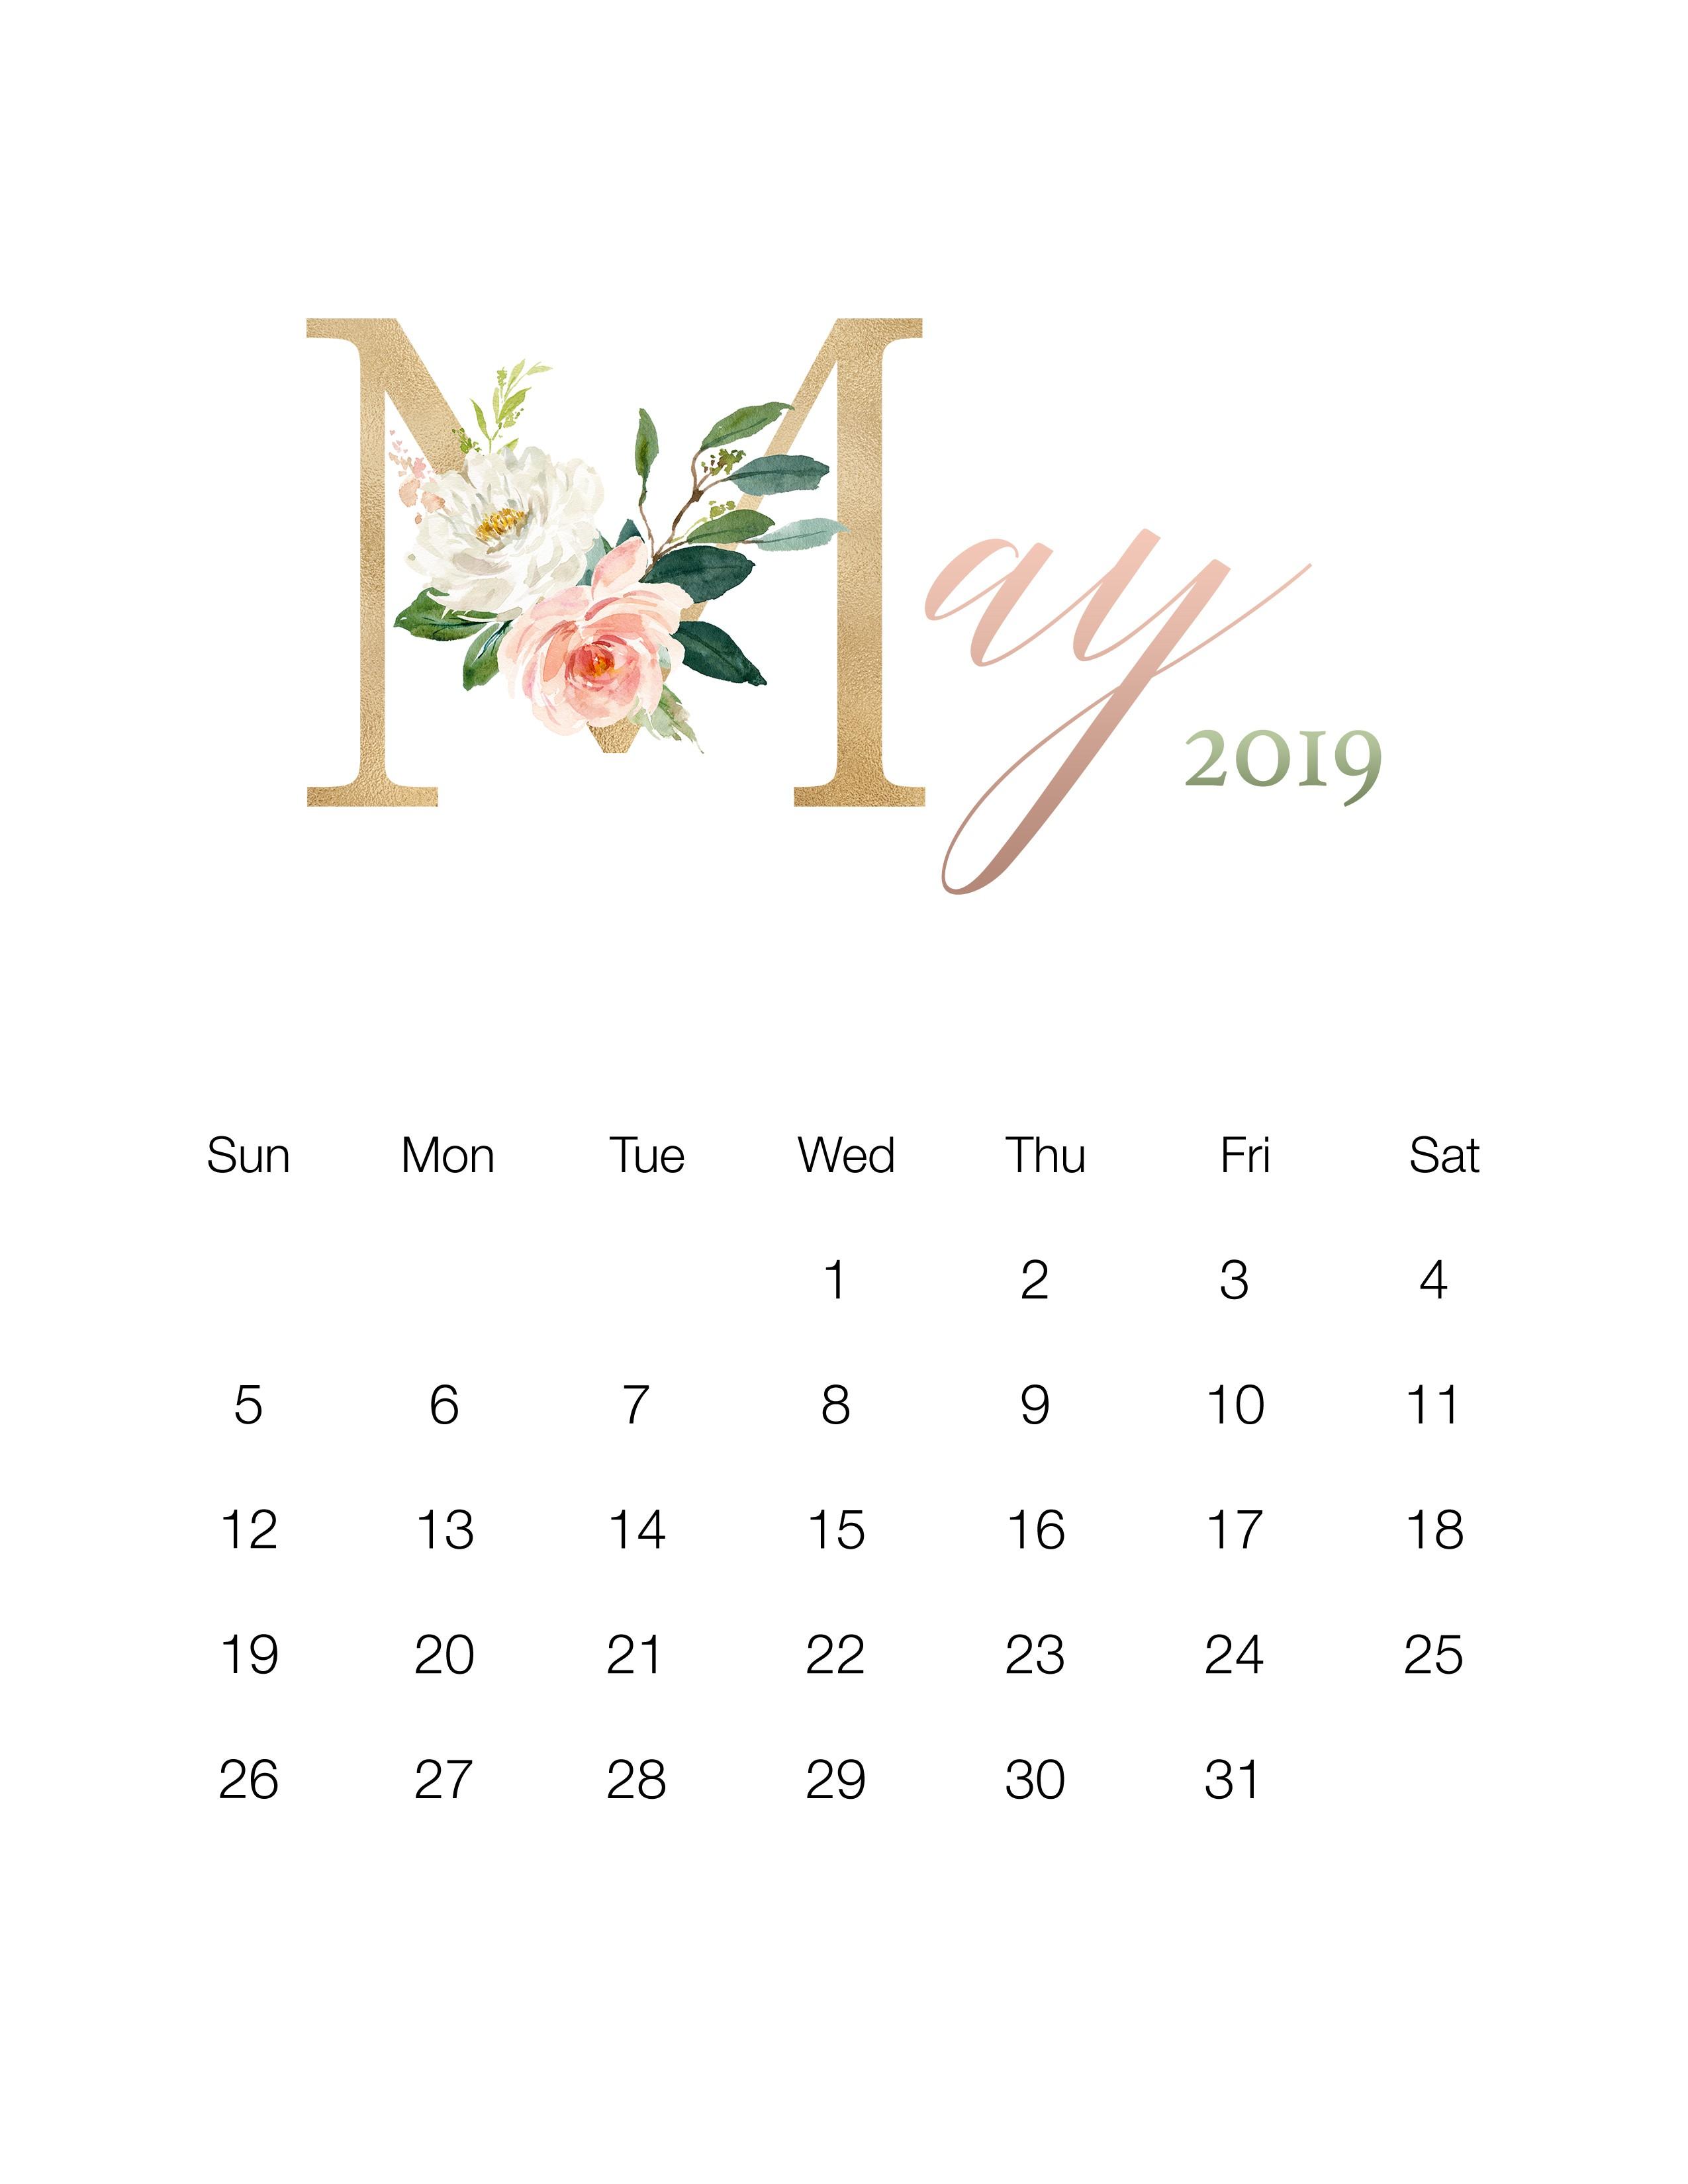 March Calendar 2019 Más Arriba-a-fecha Pretty Floral Free Printable 2019 Calendar the Cottage Market Of March Calendar 2019 Actual Gujarati Calendar 2019 Printable Printed for No Cost – Calendaro